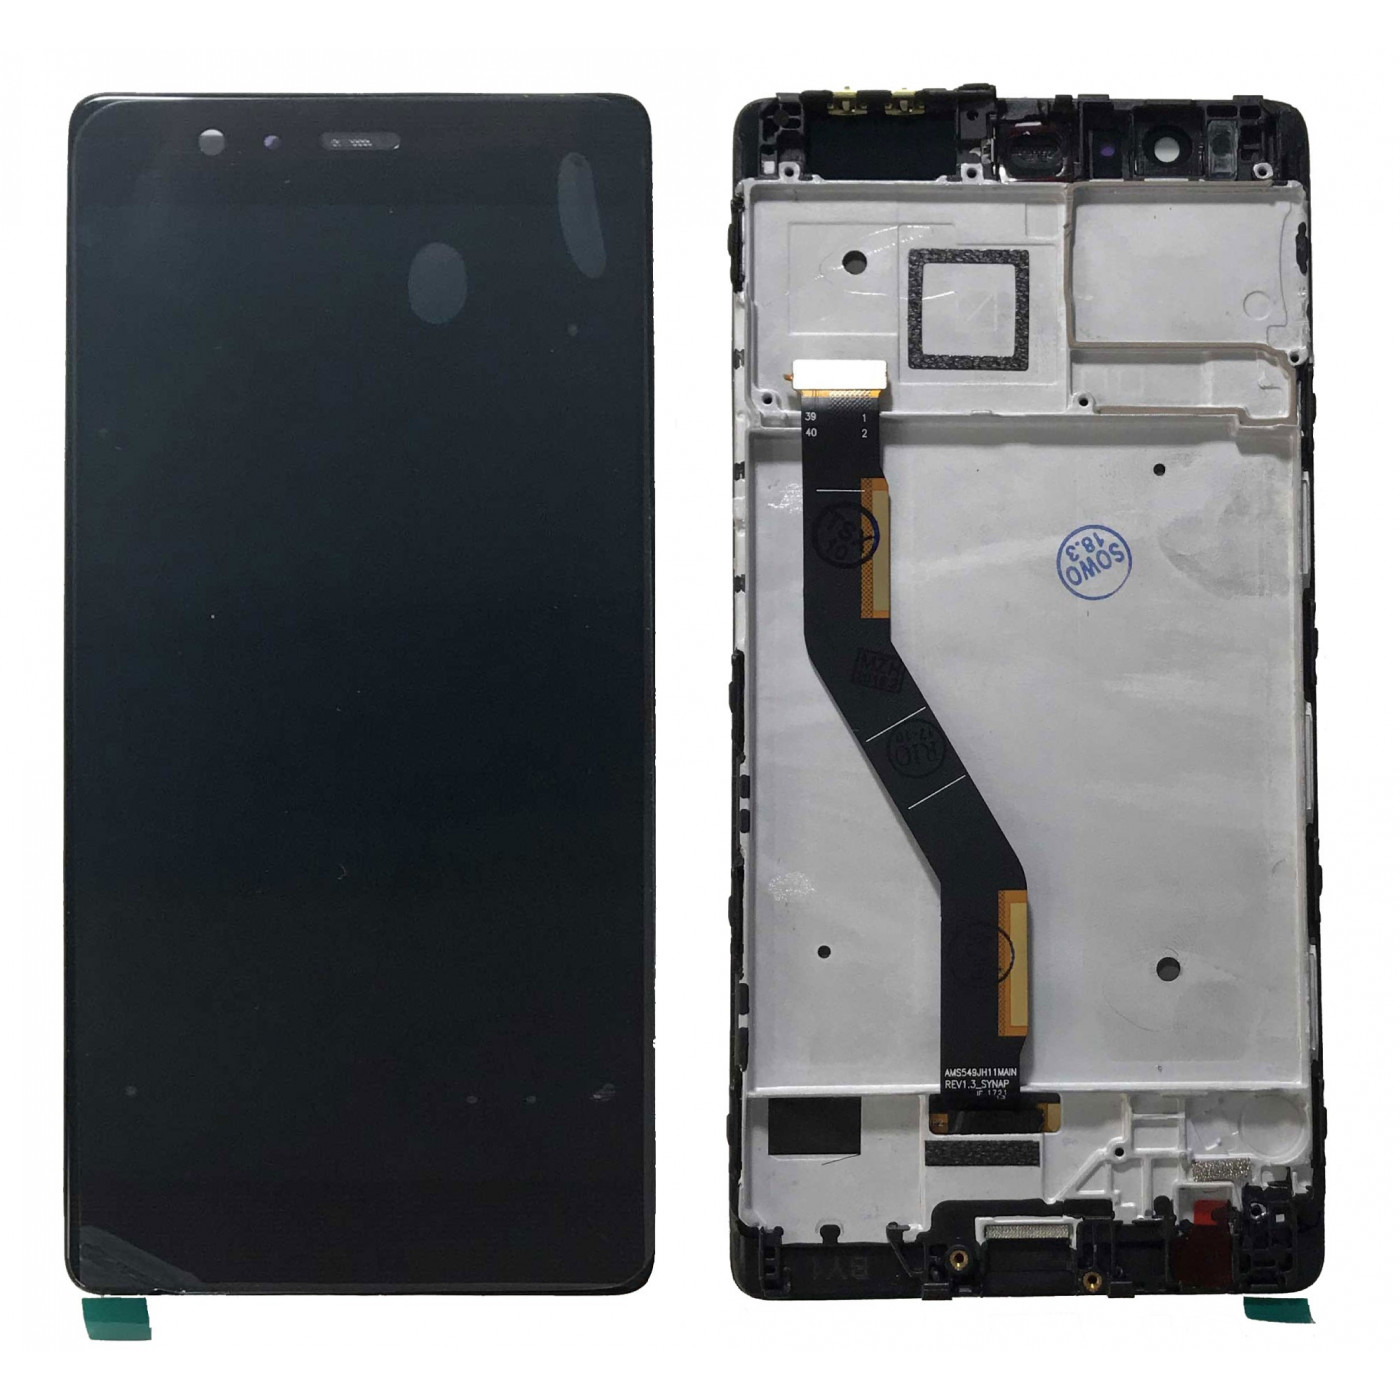 LCD-ANZEIGE Für Huawei P9 PLUS VIE-L09 BLACK FRAME TOUCH SCREEN GLASS